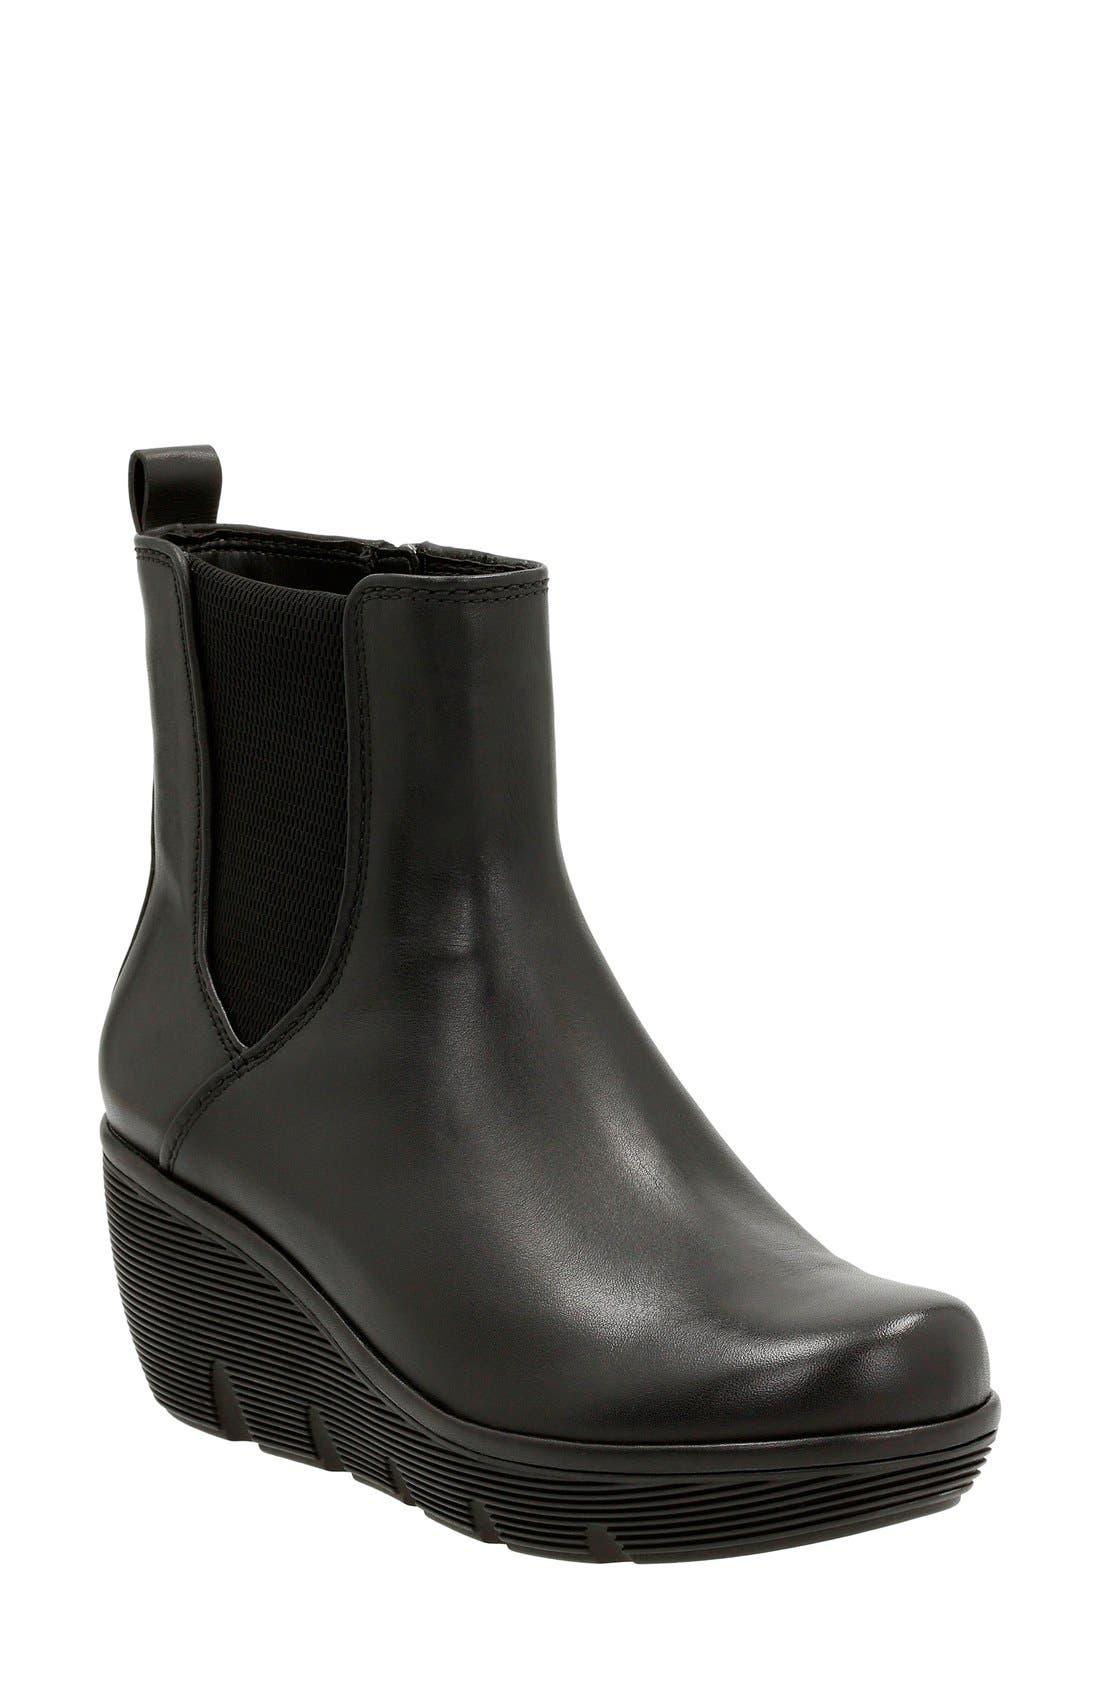 Alternate Image 1 Selected - Clarks® 'Clarene Surf' Wedge Chelsea Boot (Women)